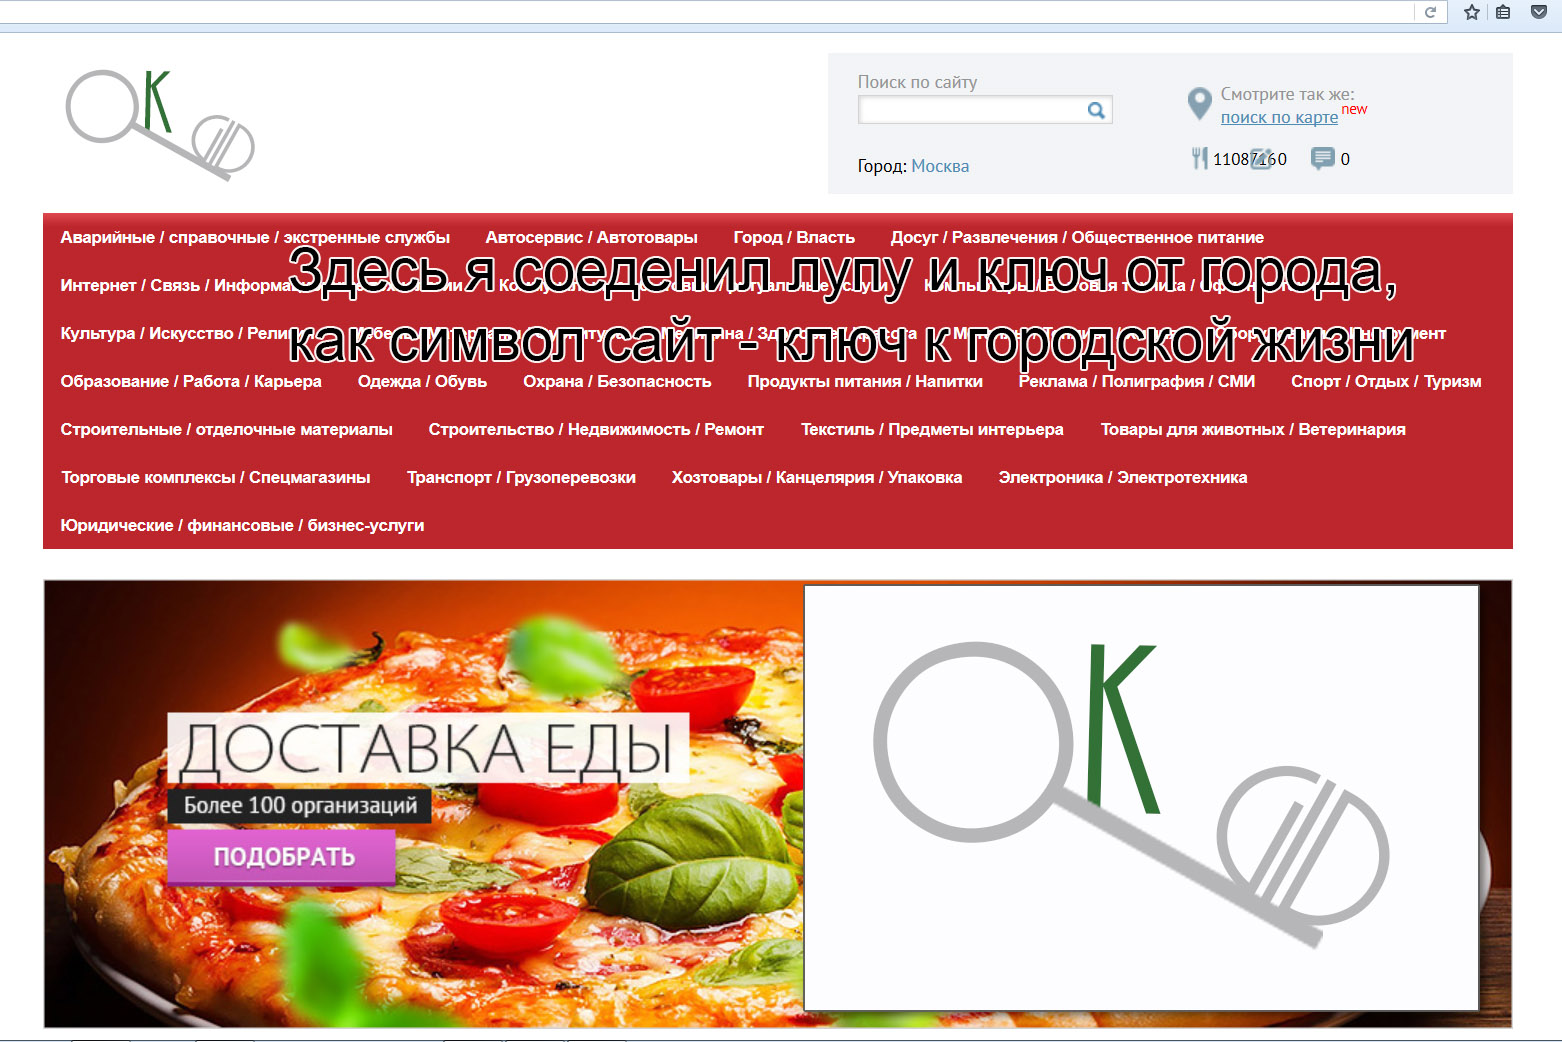 Логотип для сайта OKgid.ru фото f_14857d27b03b13cb.jpg